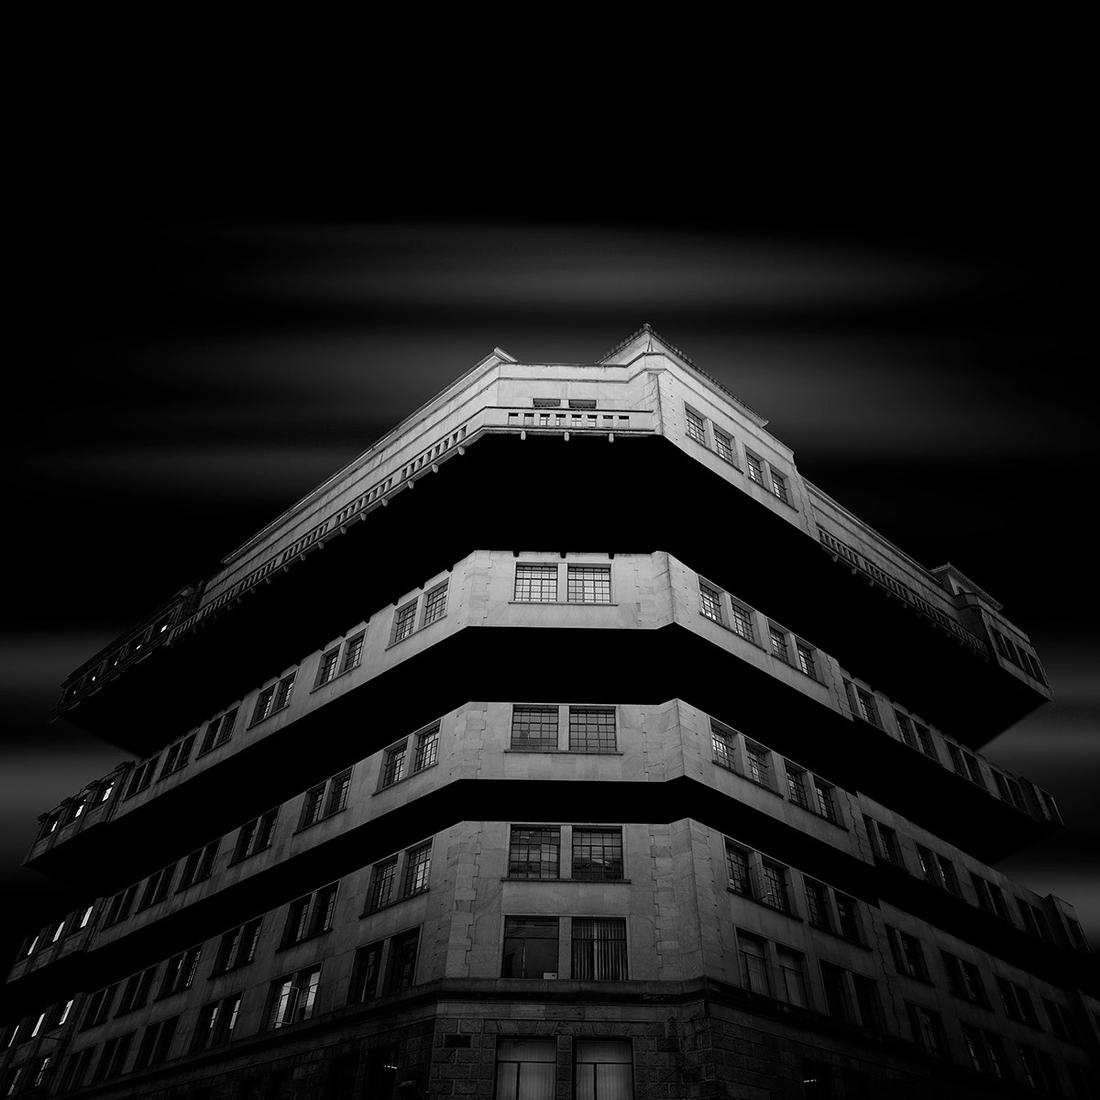 05-Daniel-Garay-Arango-Black-and-White-Surreal-Photographs-Architectural-Deconstruction-www-designstack-co